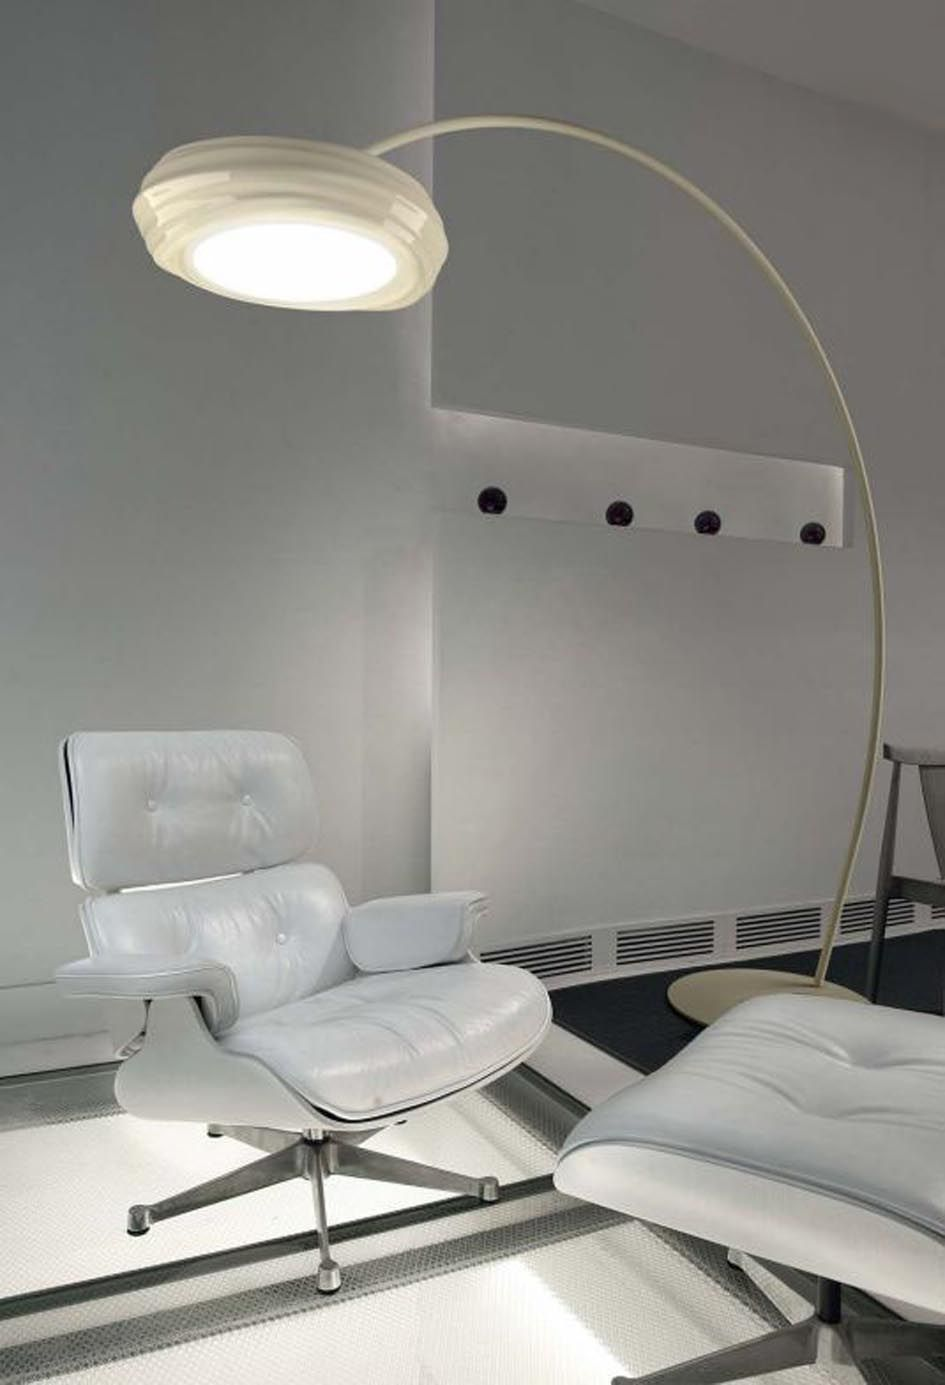 Lamparas modernas pie de salon colecci n tuareg - Iluminacion de pie ...